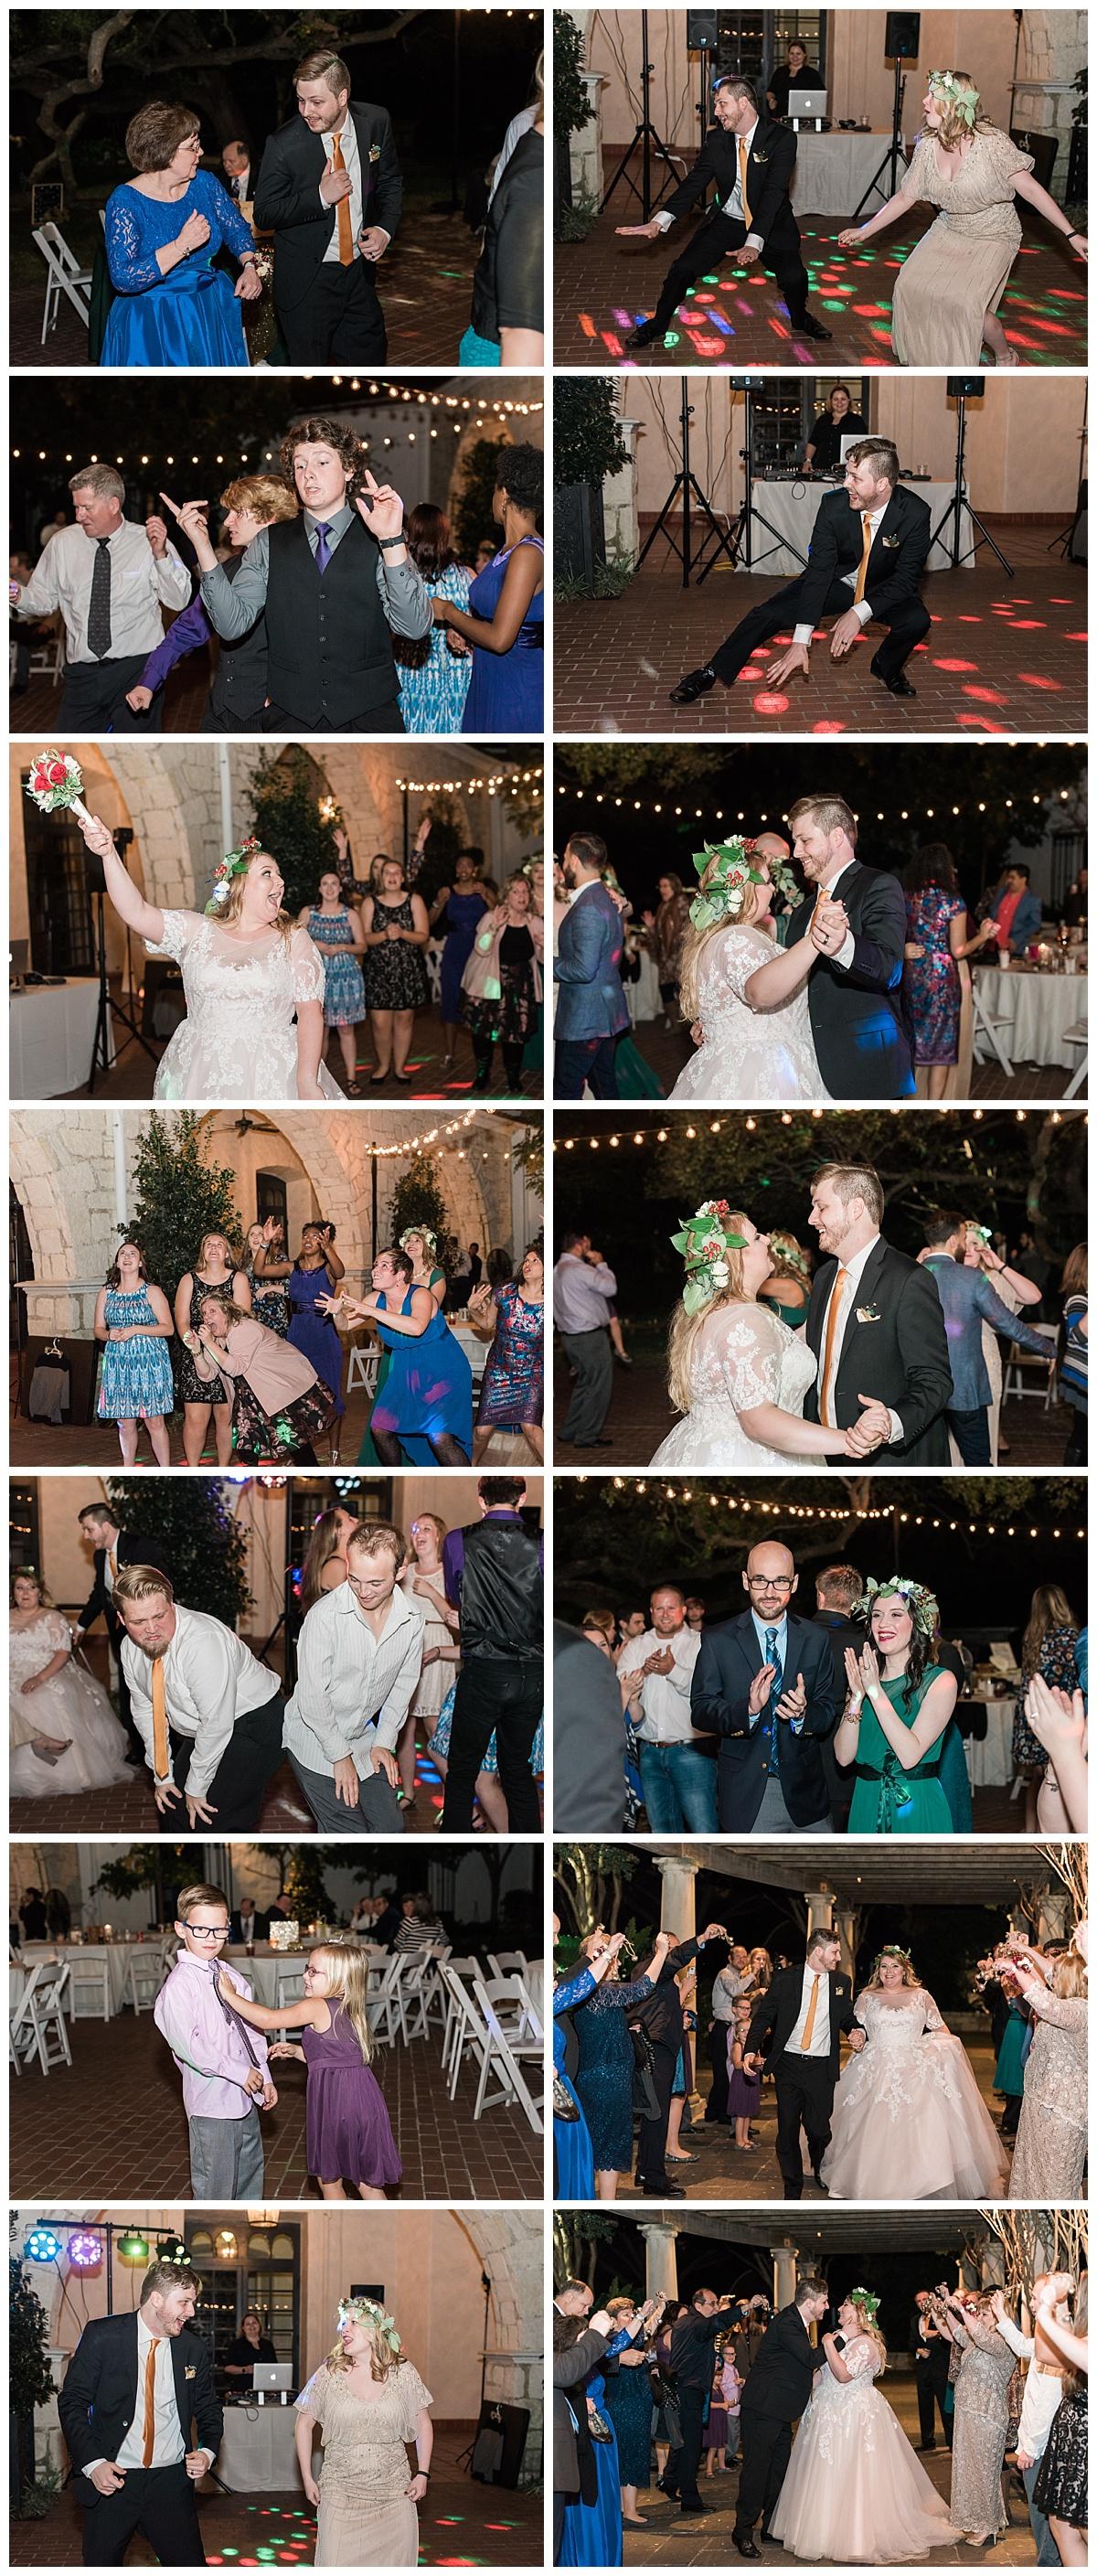 dallas-arboretum-and-botanical-garden-wedding-ar-photography-8.jpg